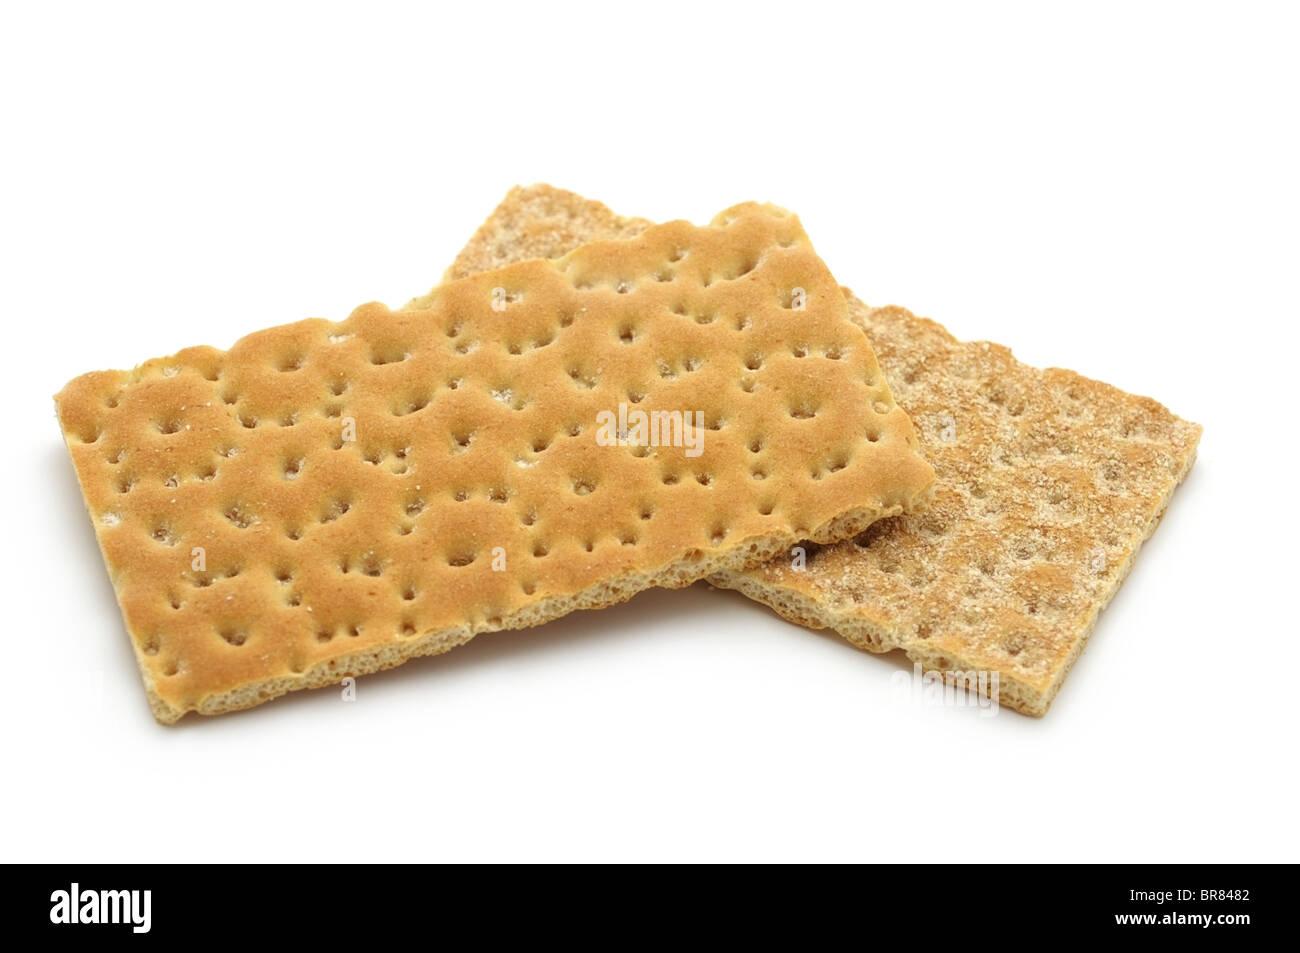 Whole Wheat Crispbread - Stock Image